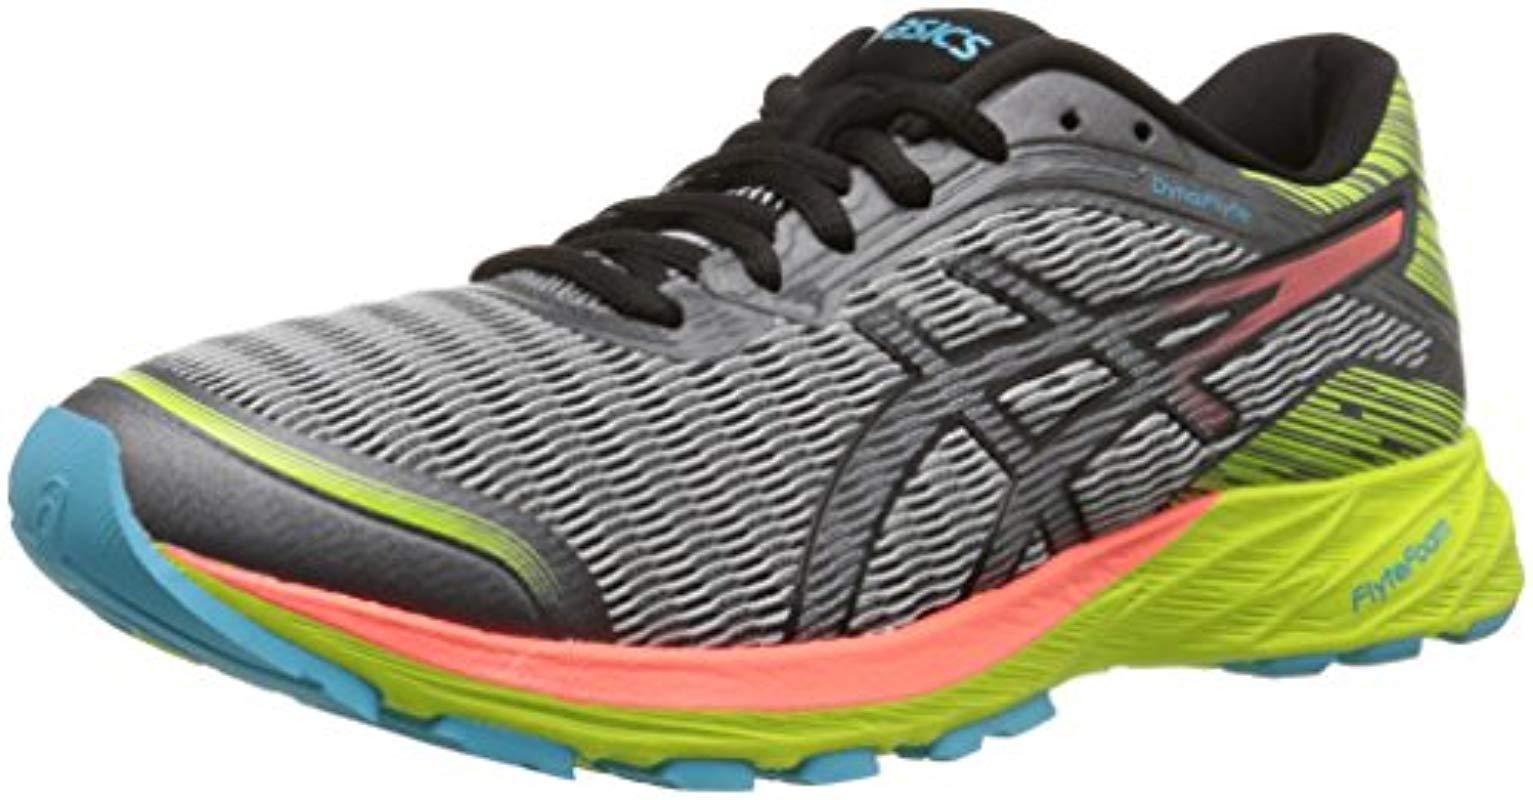 best website 9b8f8 089e0 Lyst - Asics Dynaflyte Running Shoe in Gray - Save 22%